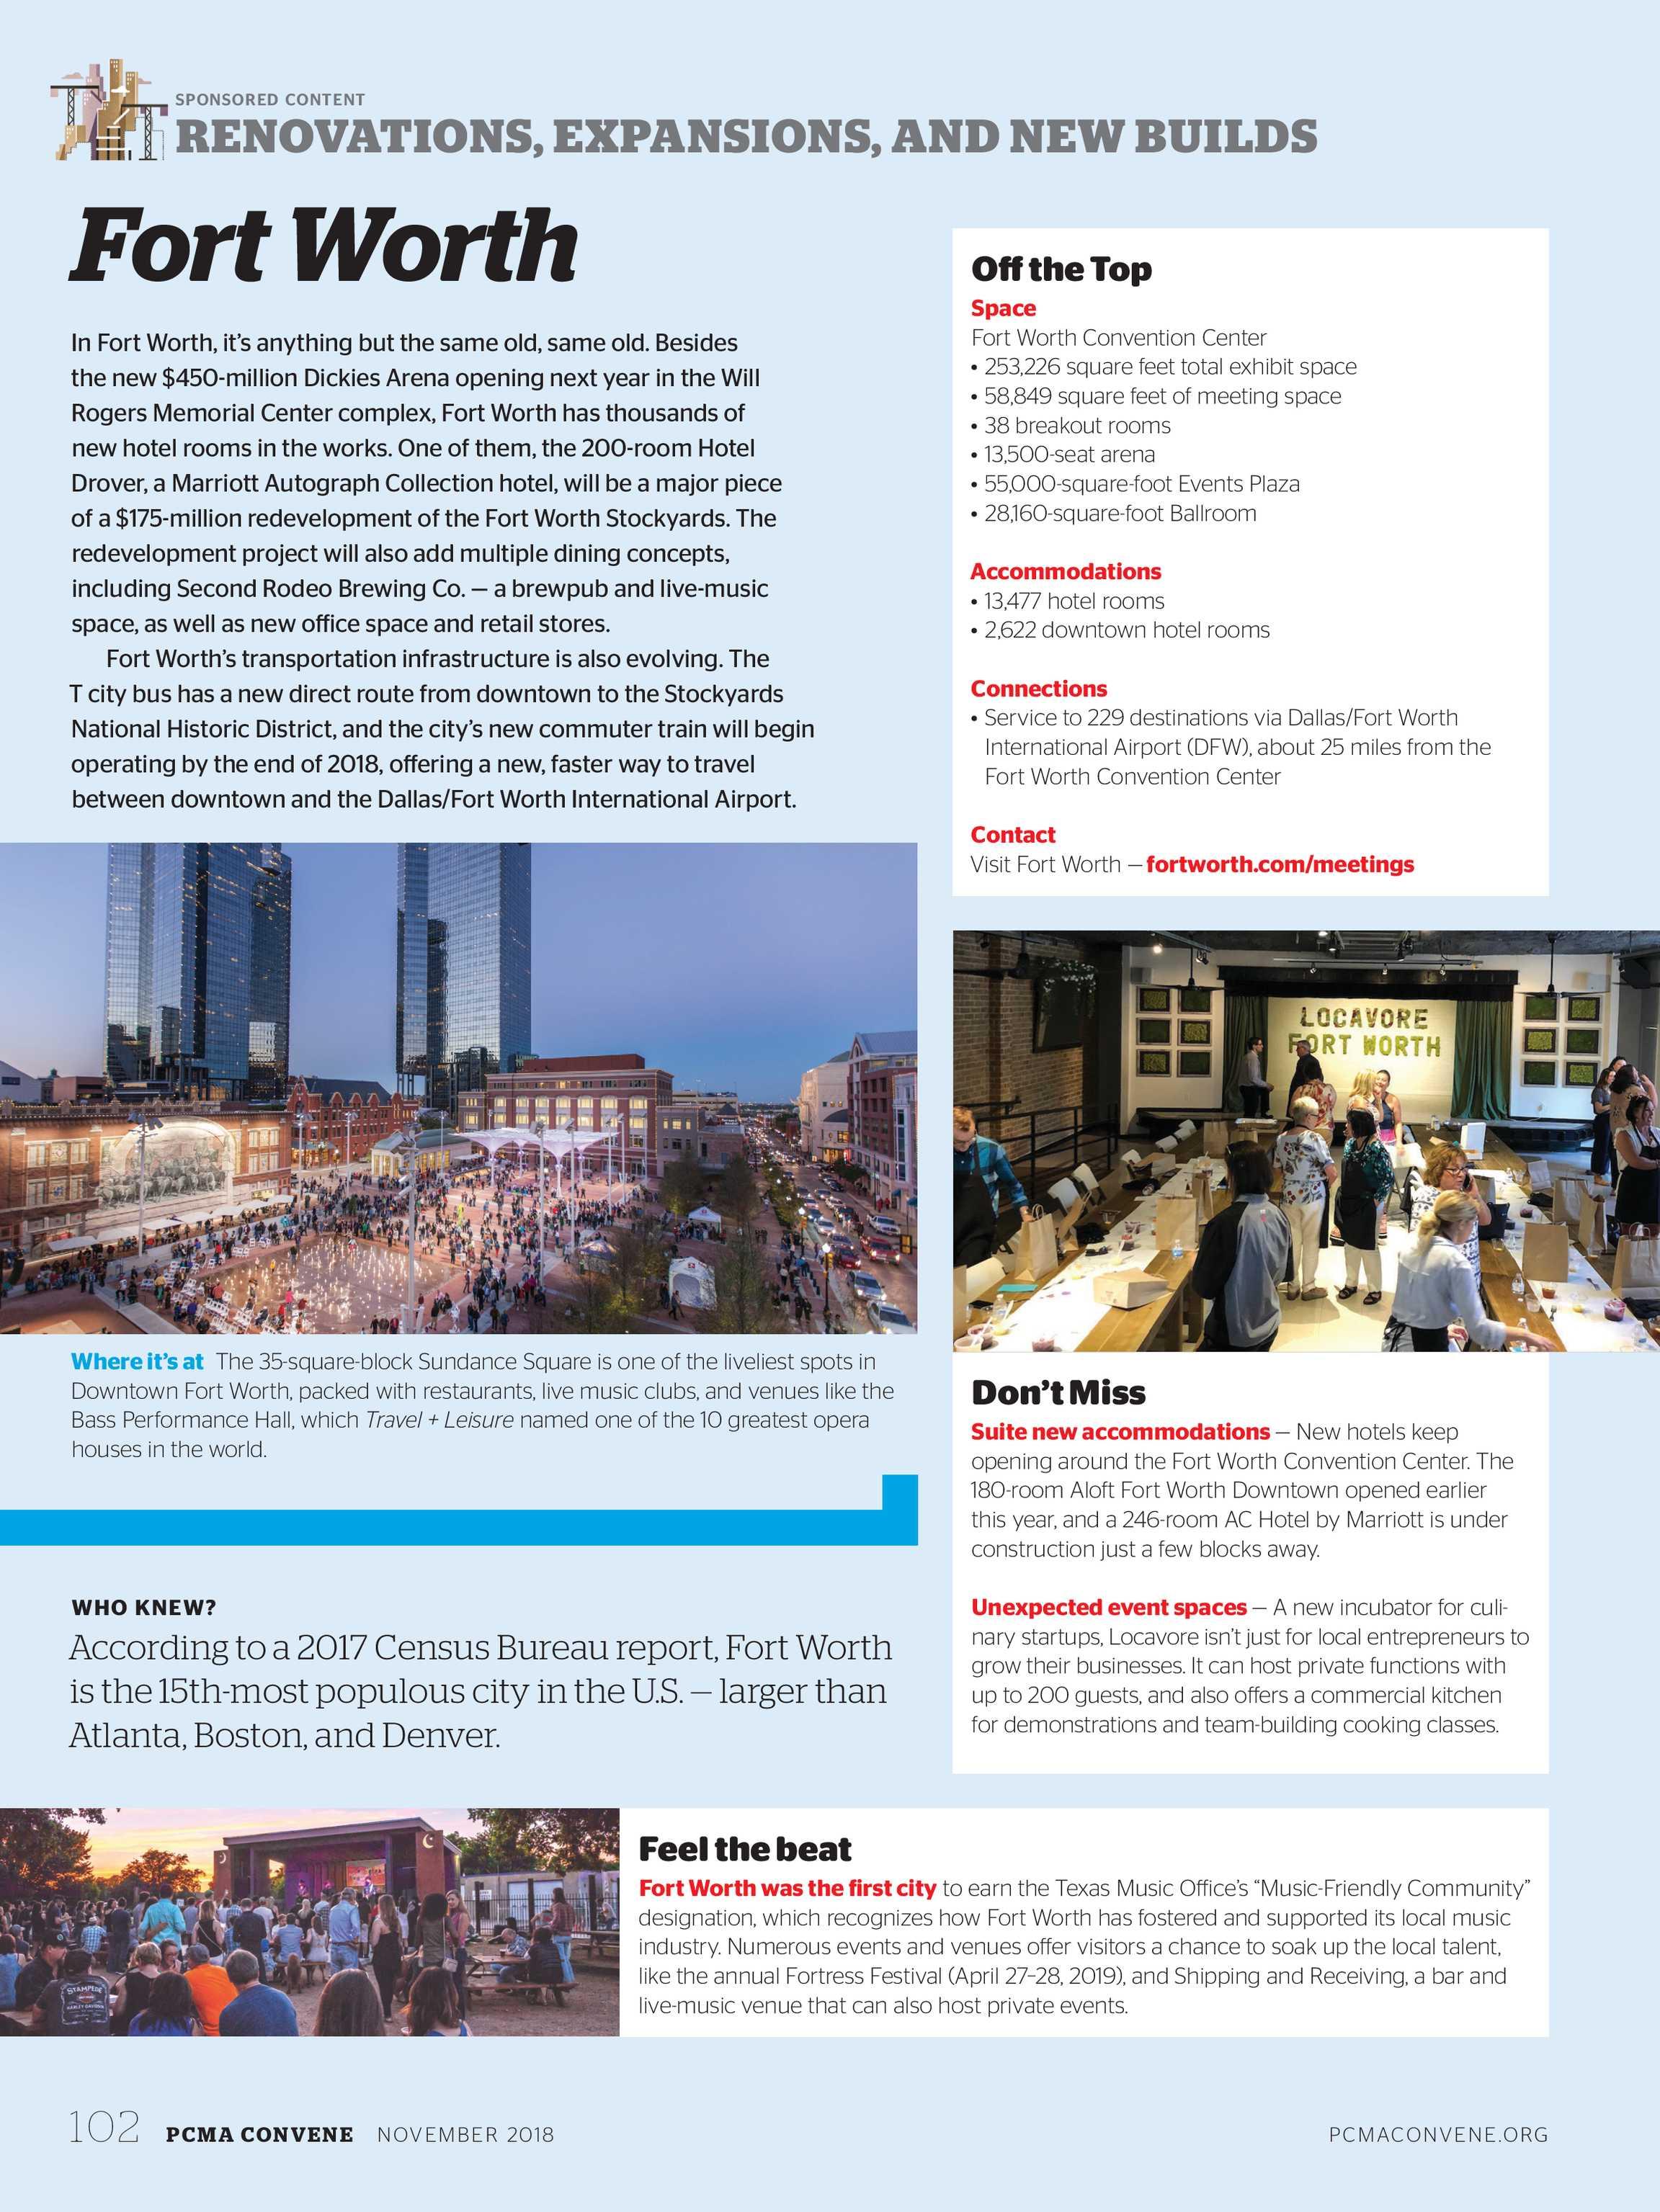 Convene - November 2018 - page 102